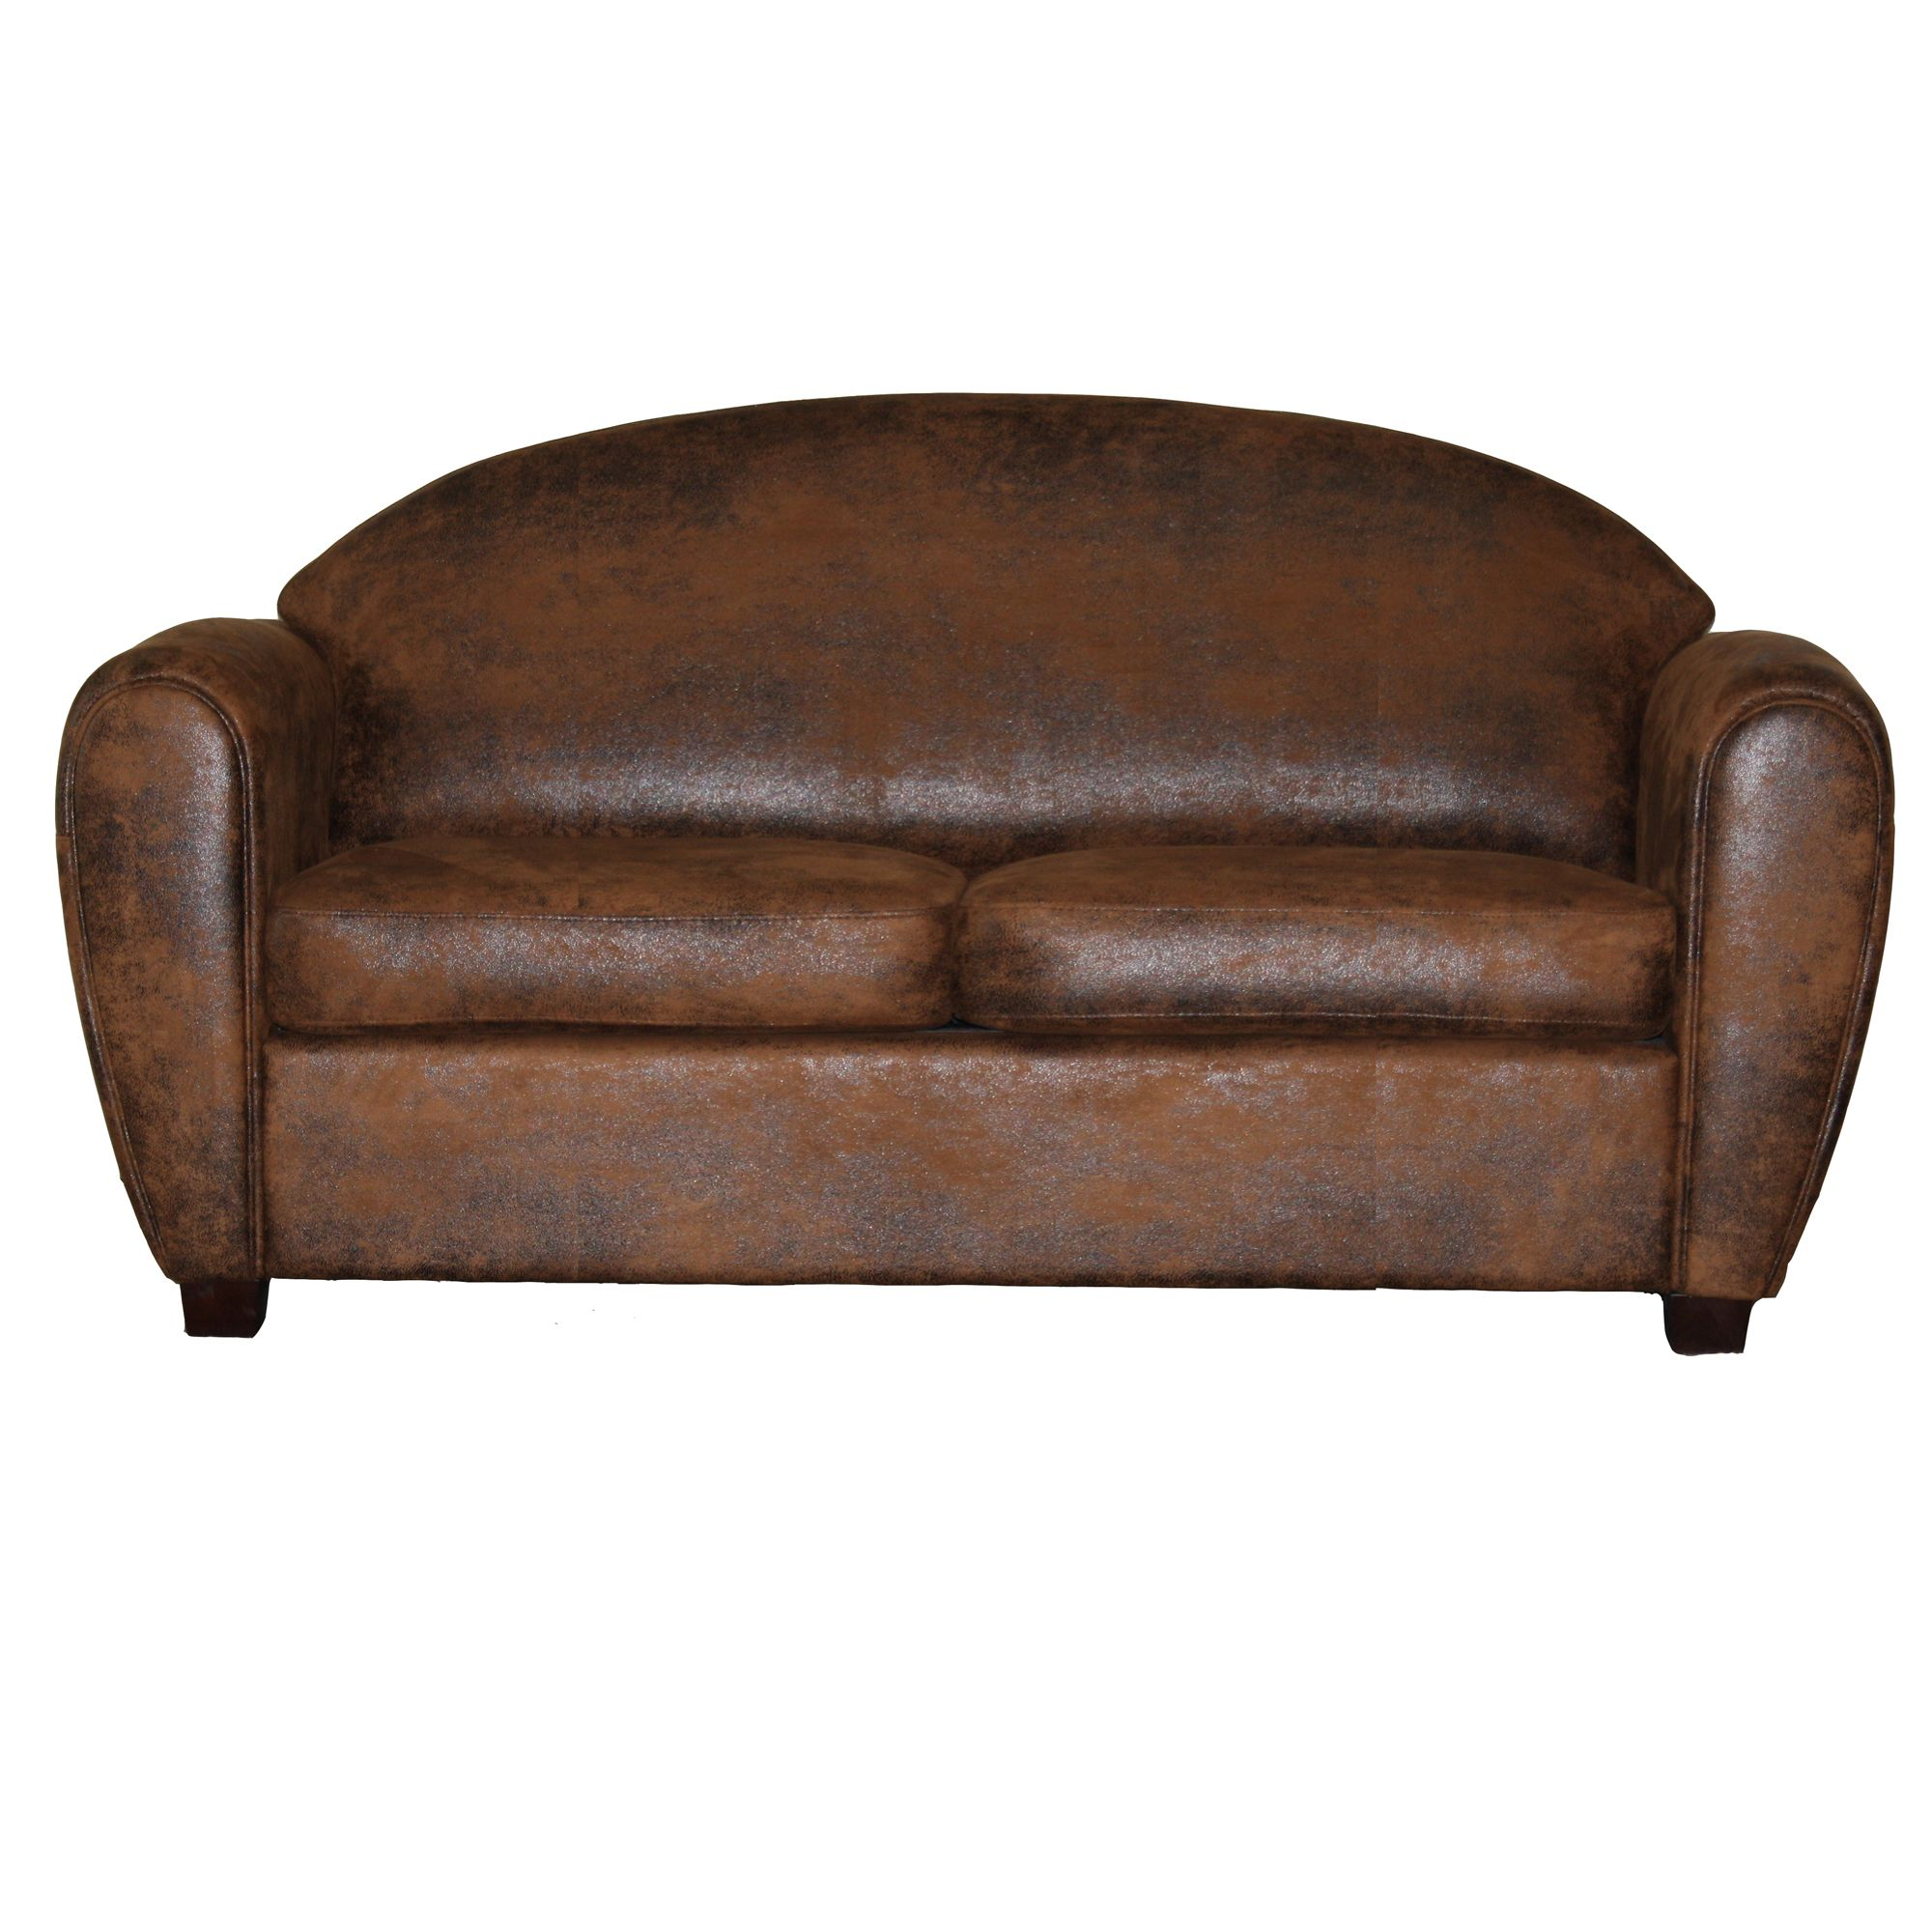 canap club convertible 3 places effet vieilli chocolat sao paulo port offert vente priv e. Black Bedroom Furniture Sets. Home Design Ideas